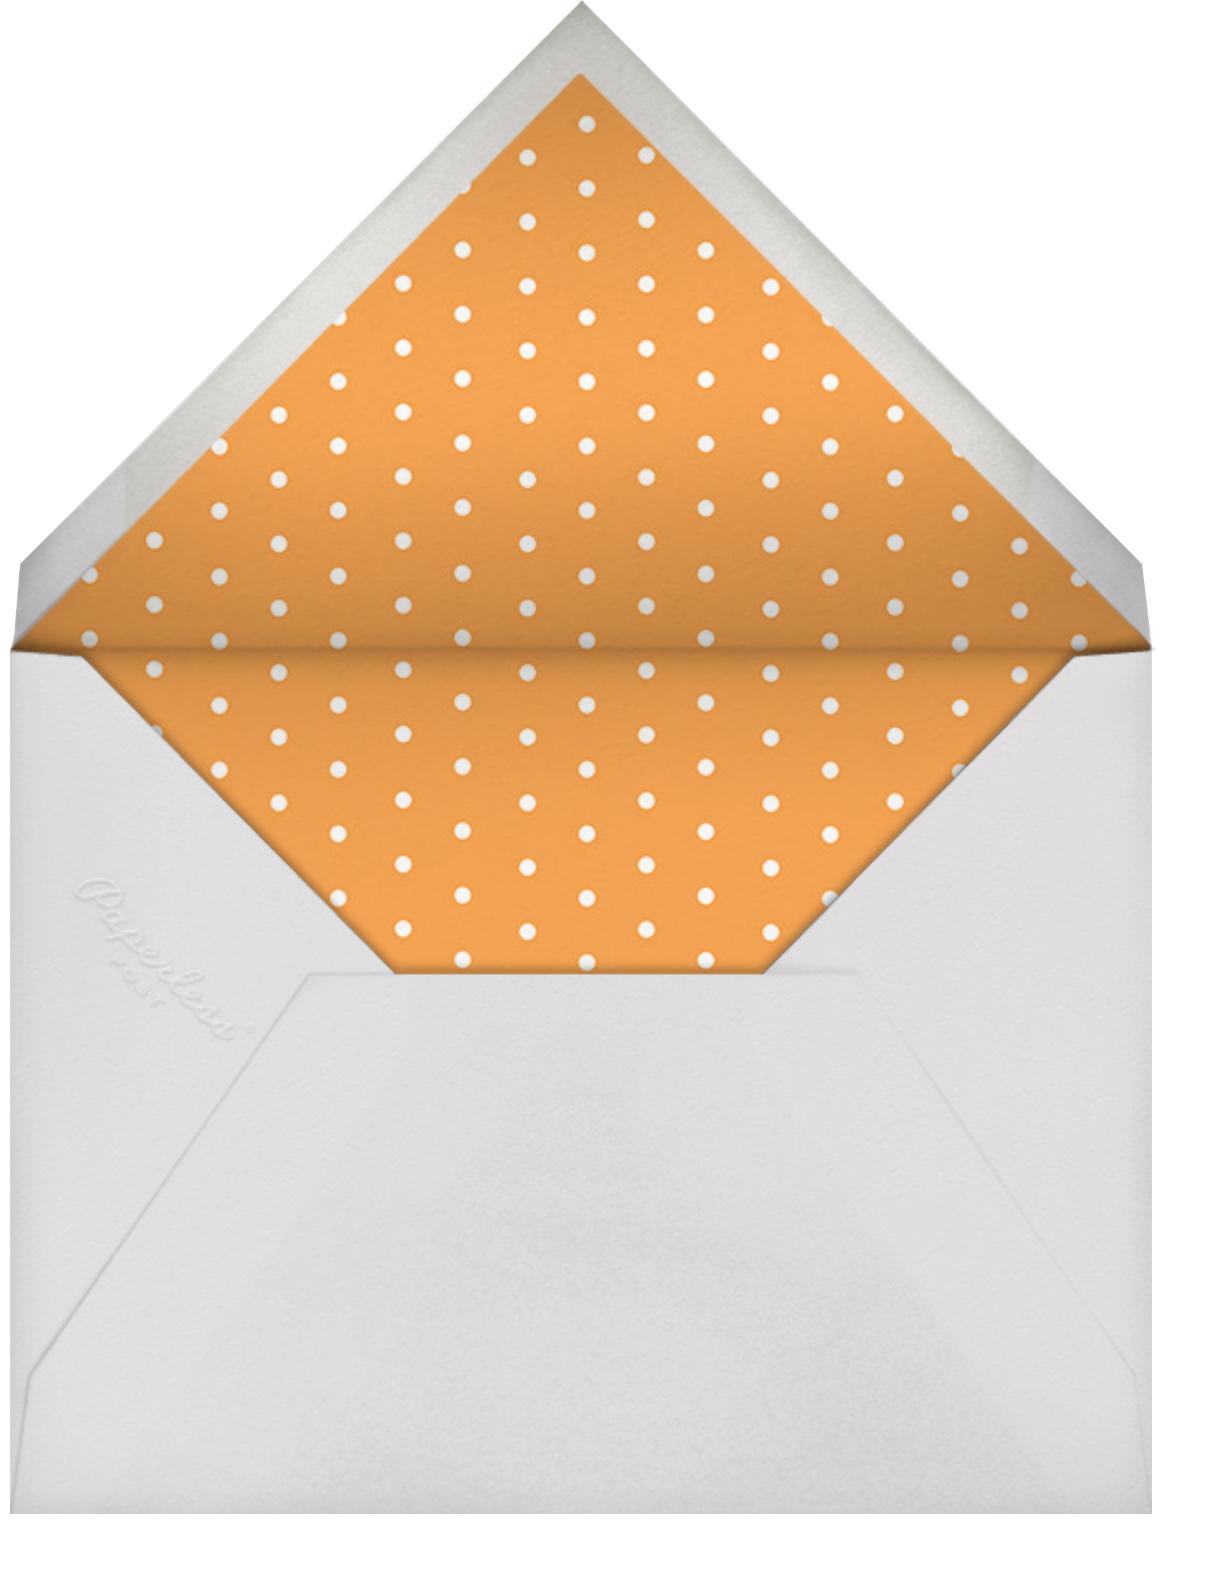 Little Treats - Rifle Paper Co. - Halloween - envelope back